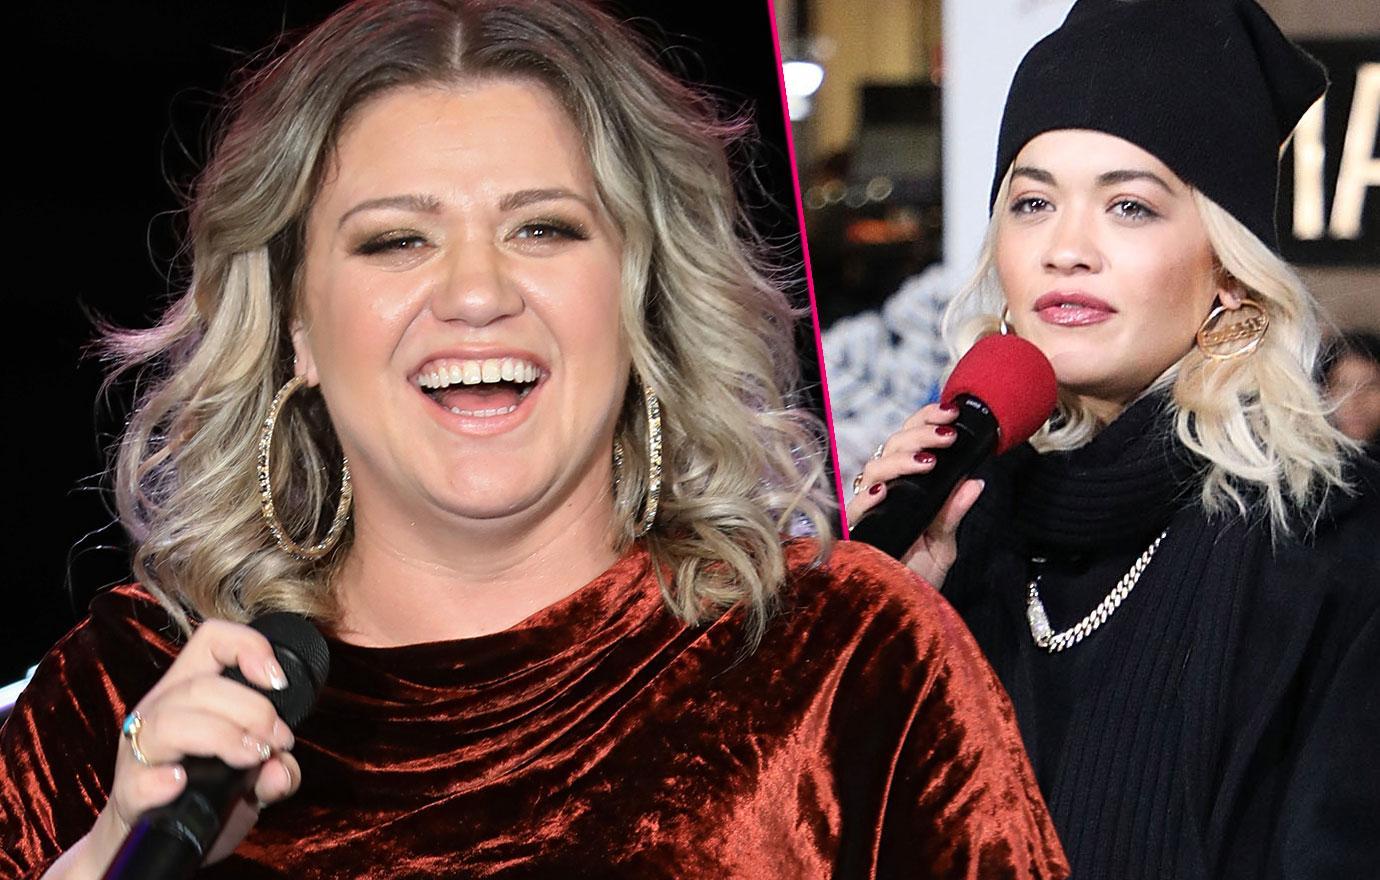 Rita Ora Slammed For Lip Sync But Kelly Clarkson Sang Live Macy's Parade